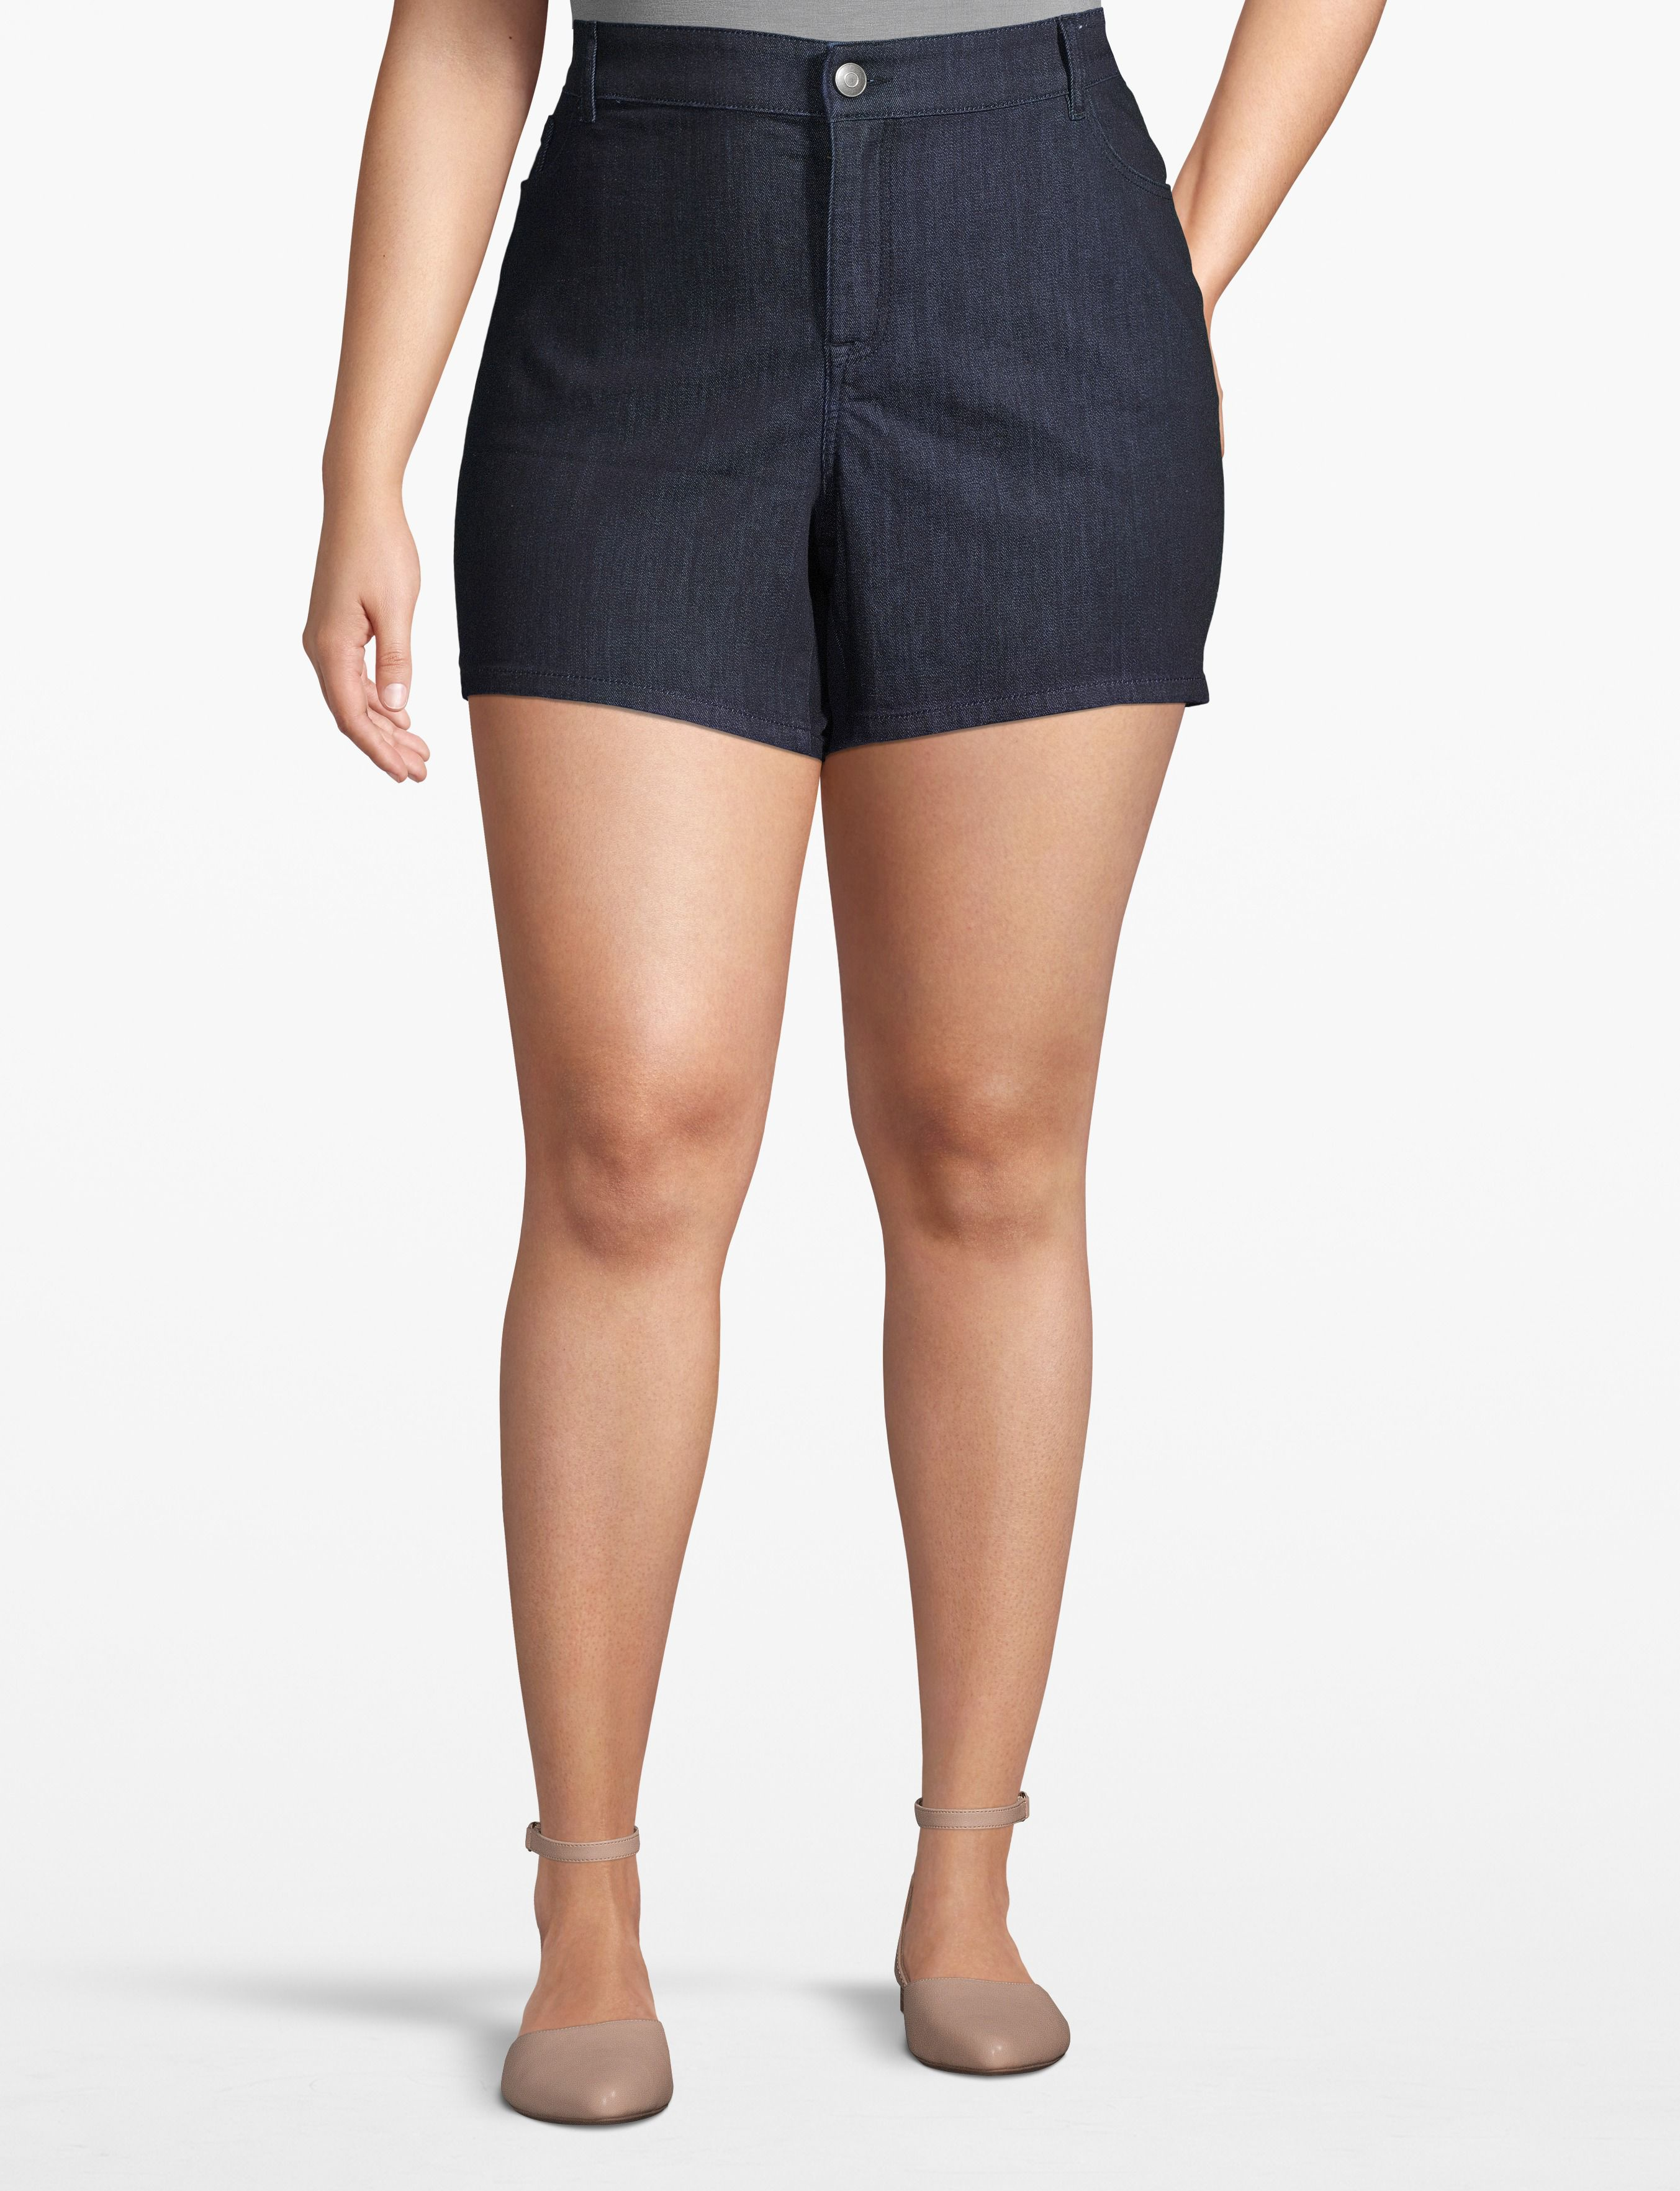 shorts,